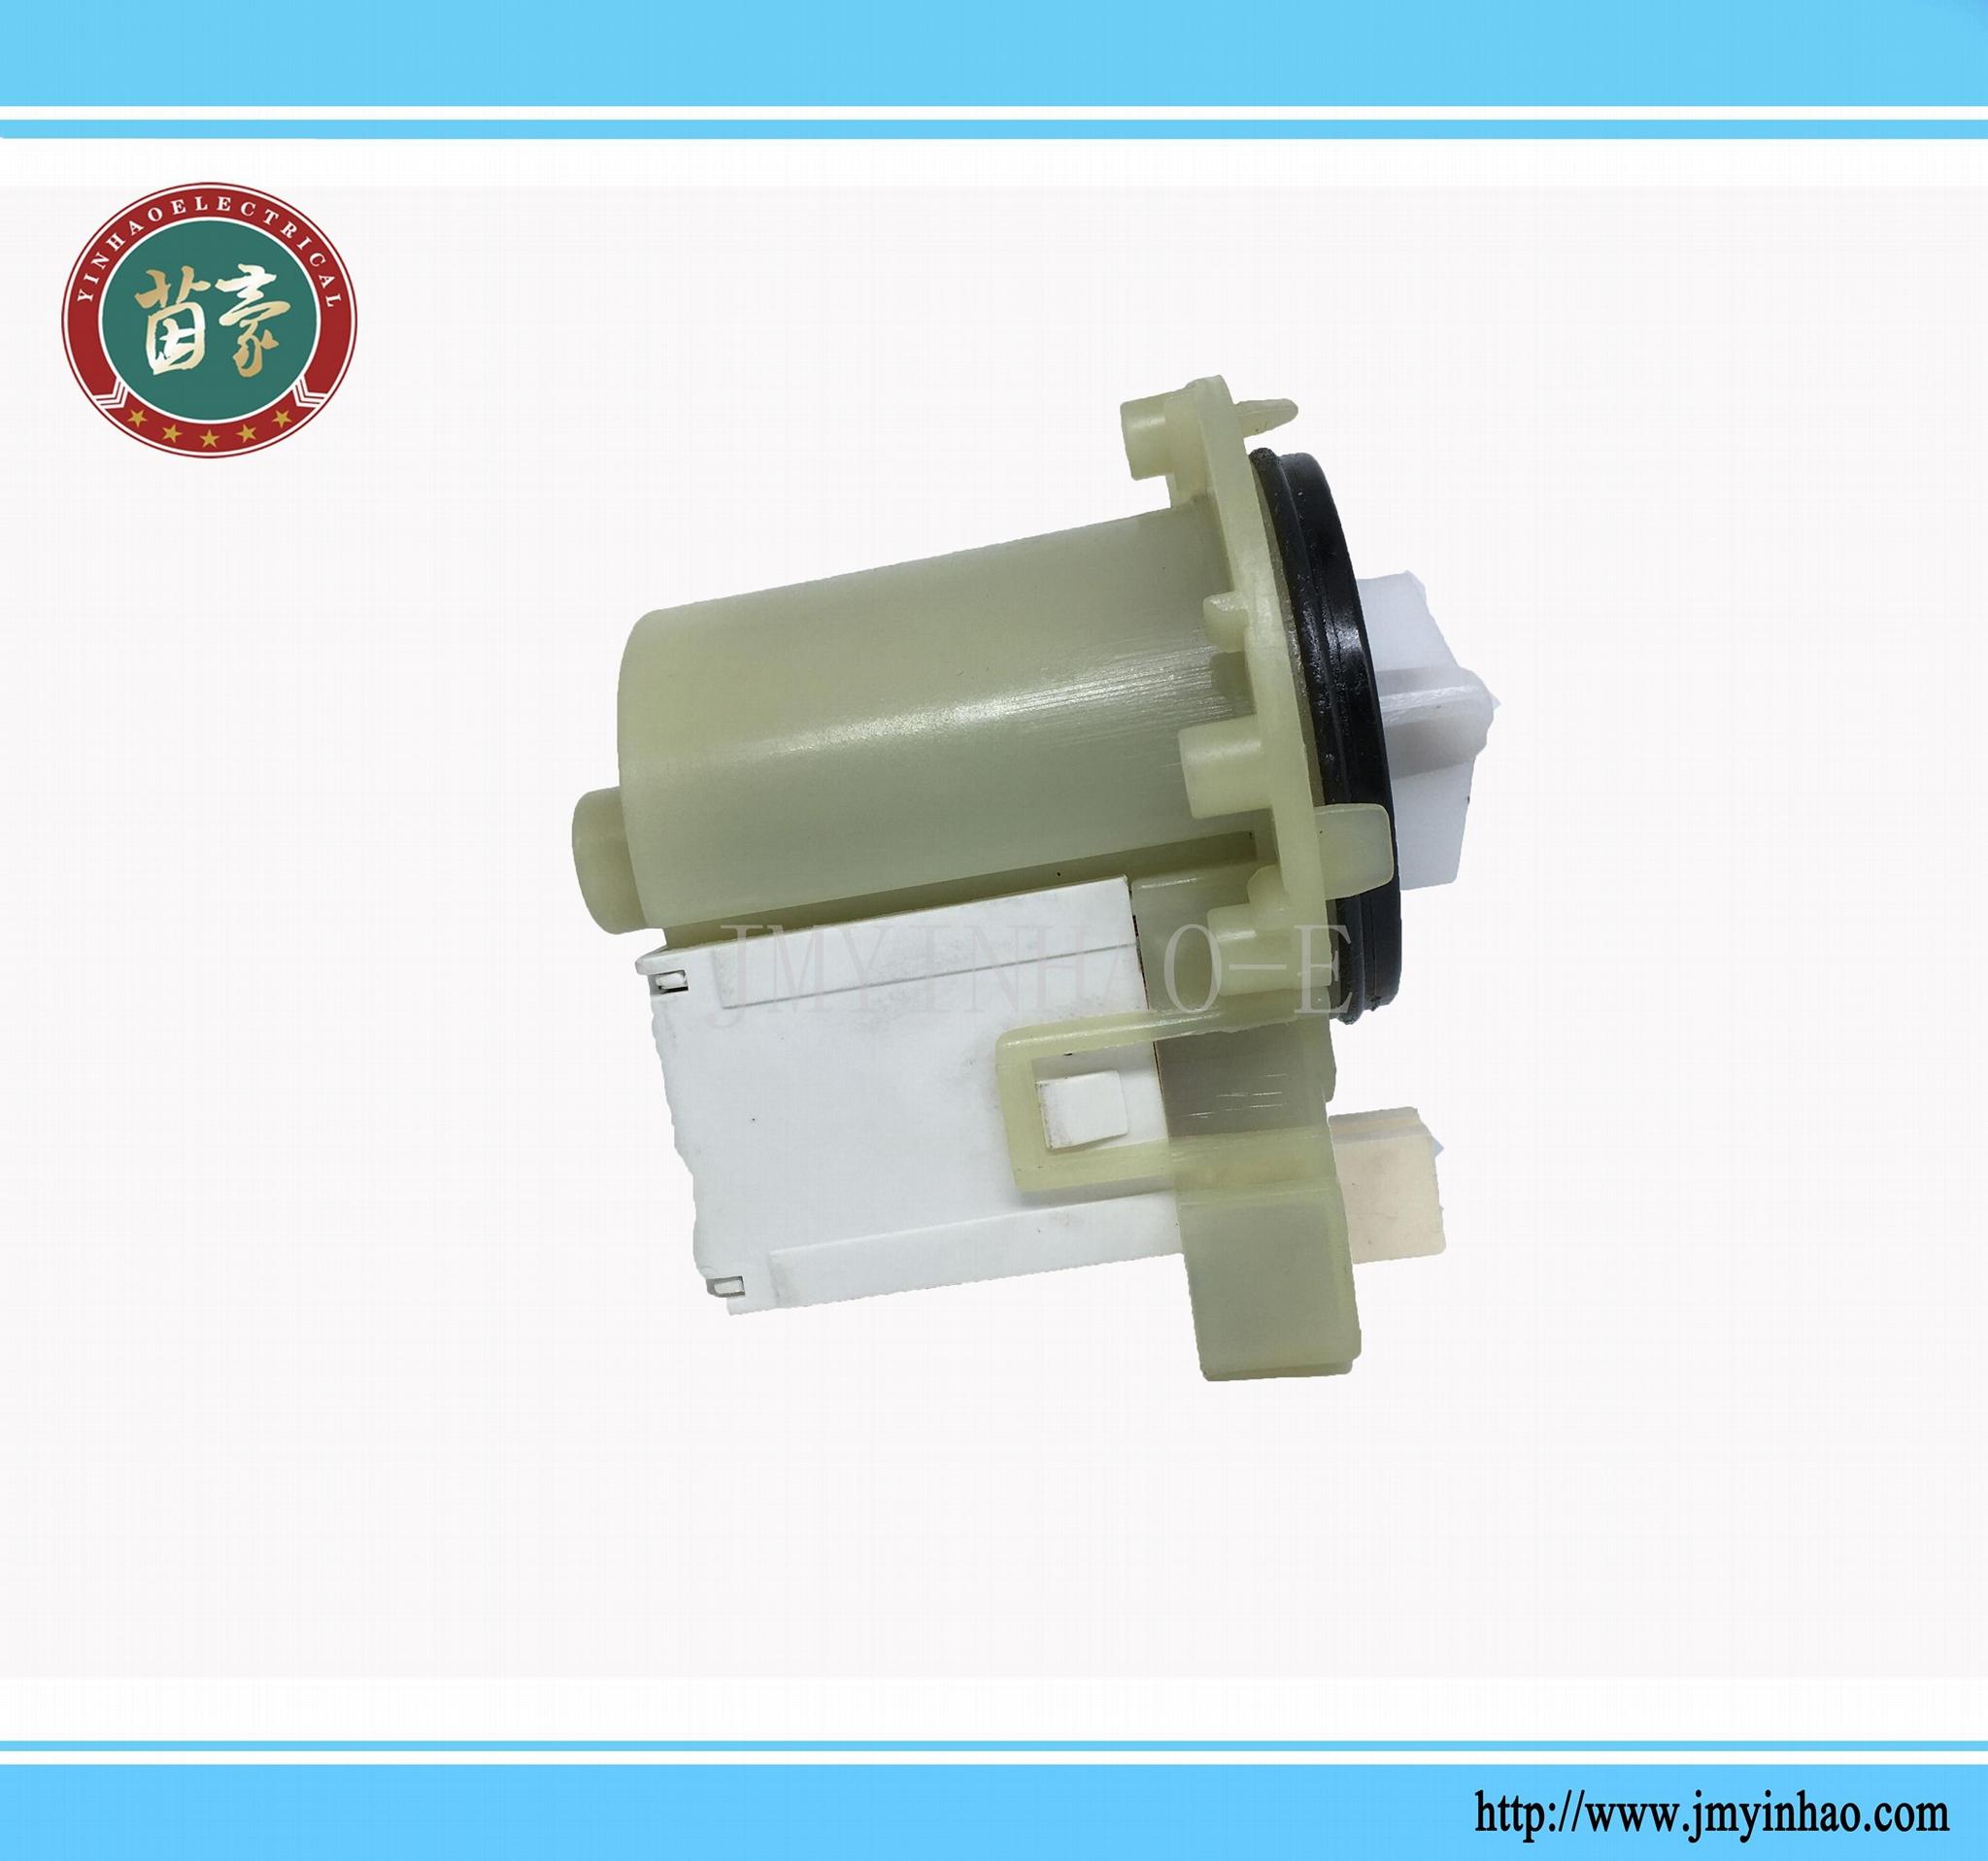 DC31-00054A Washer Drain Pump for Samsung PS4204638 AP4202690 Washing Machine 1